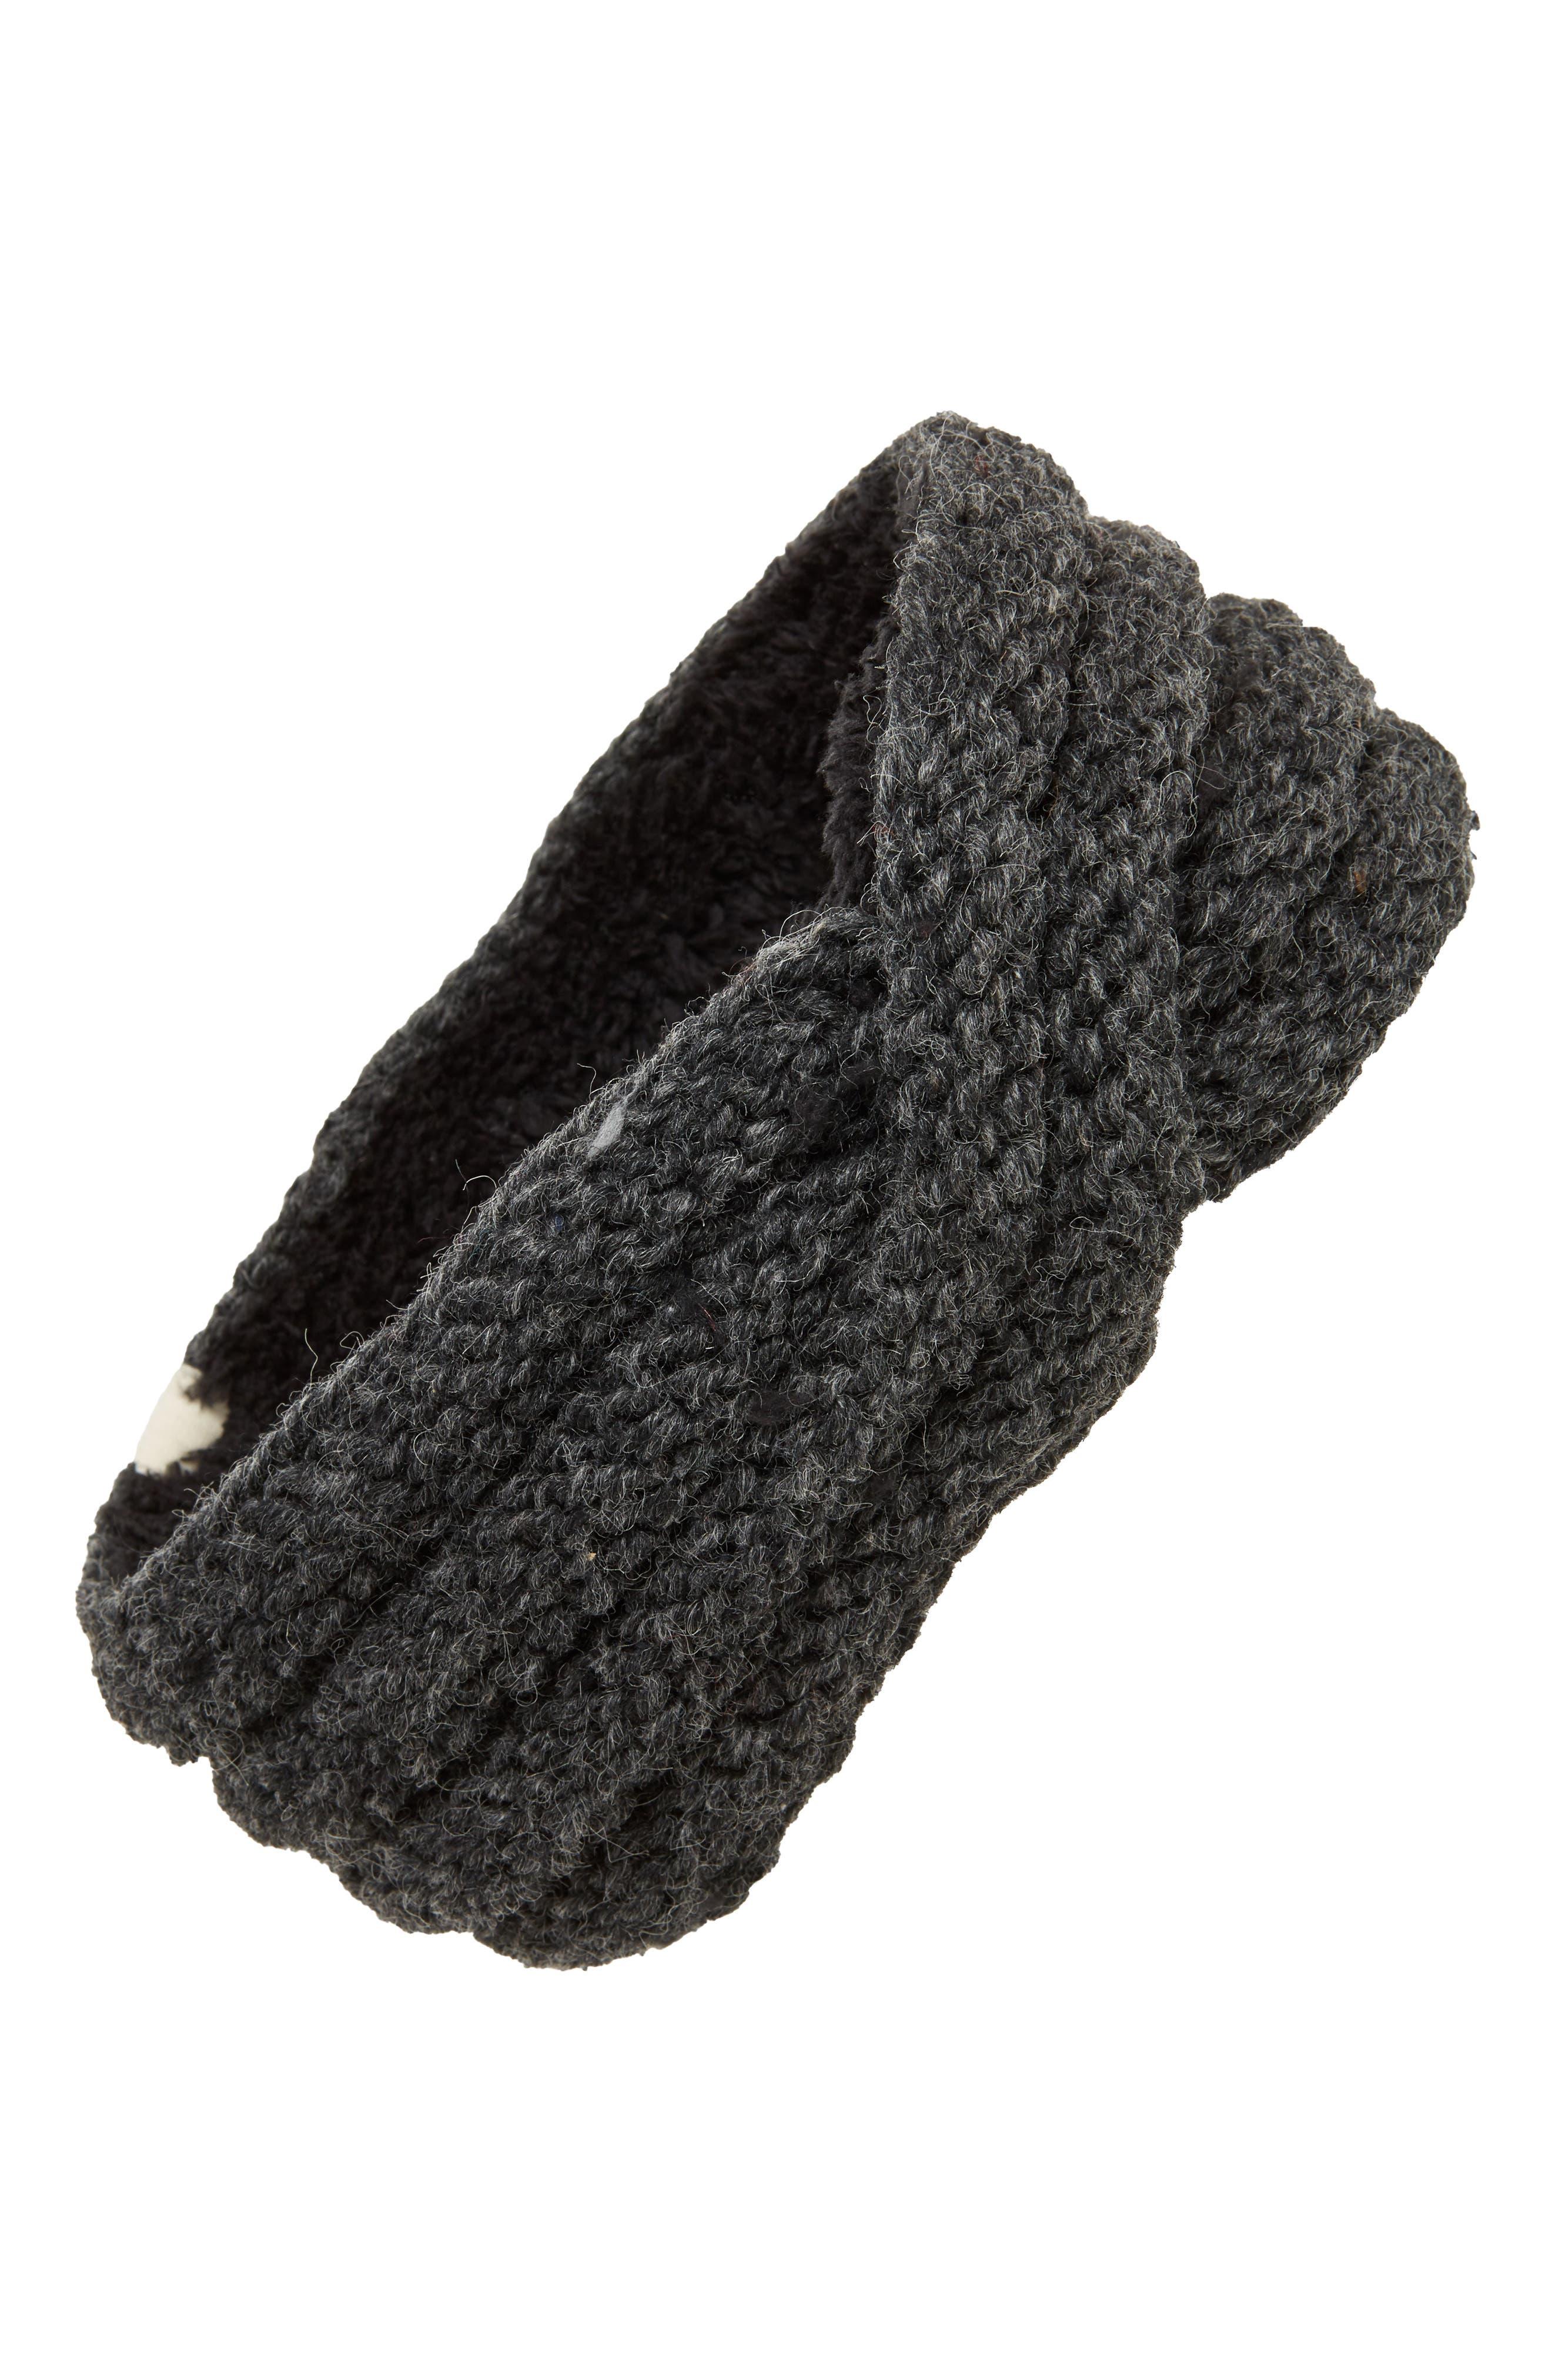 Veronica Cabled Wool Headband,                             Main thumbnail 1, color,                             CHARCOAL